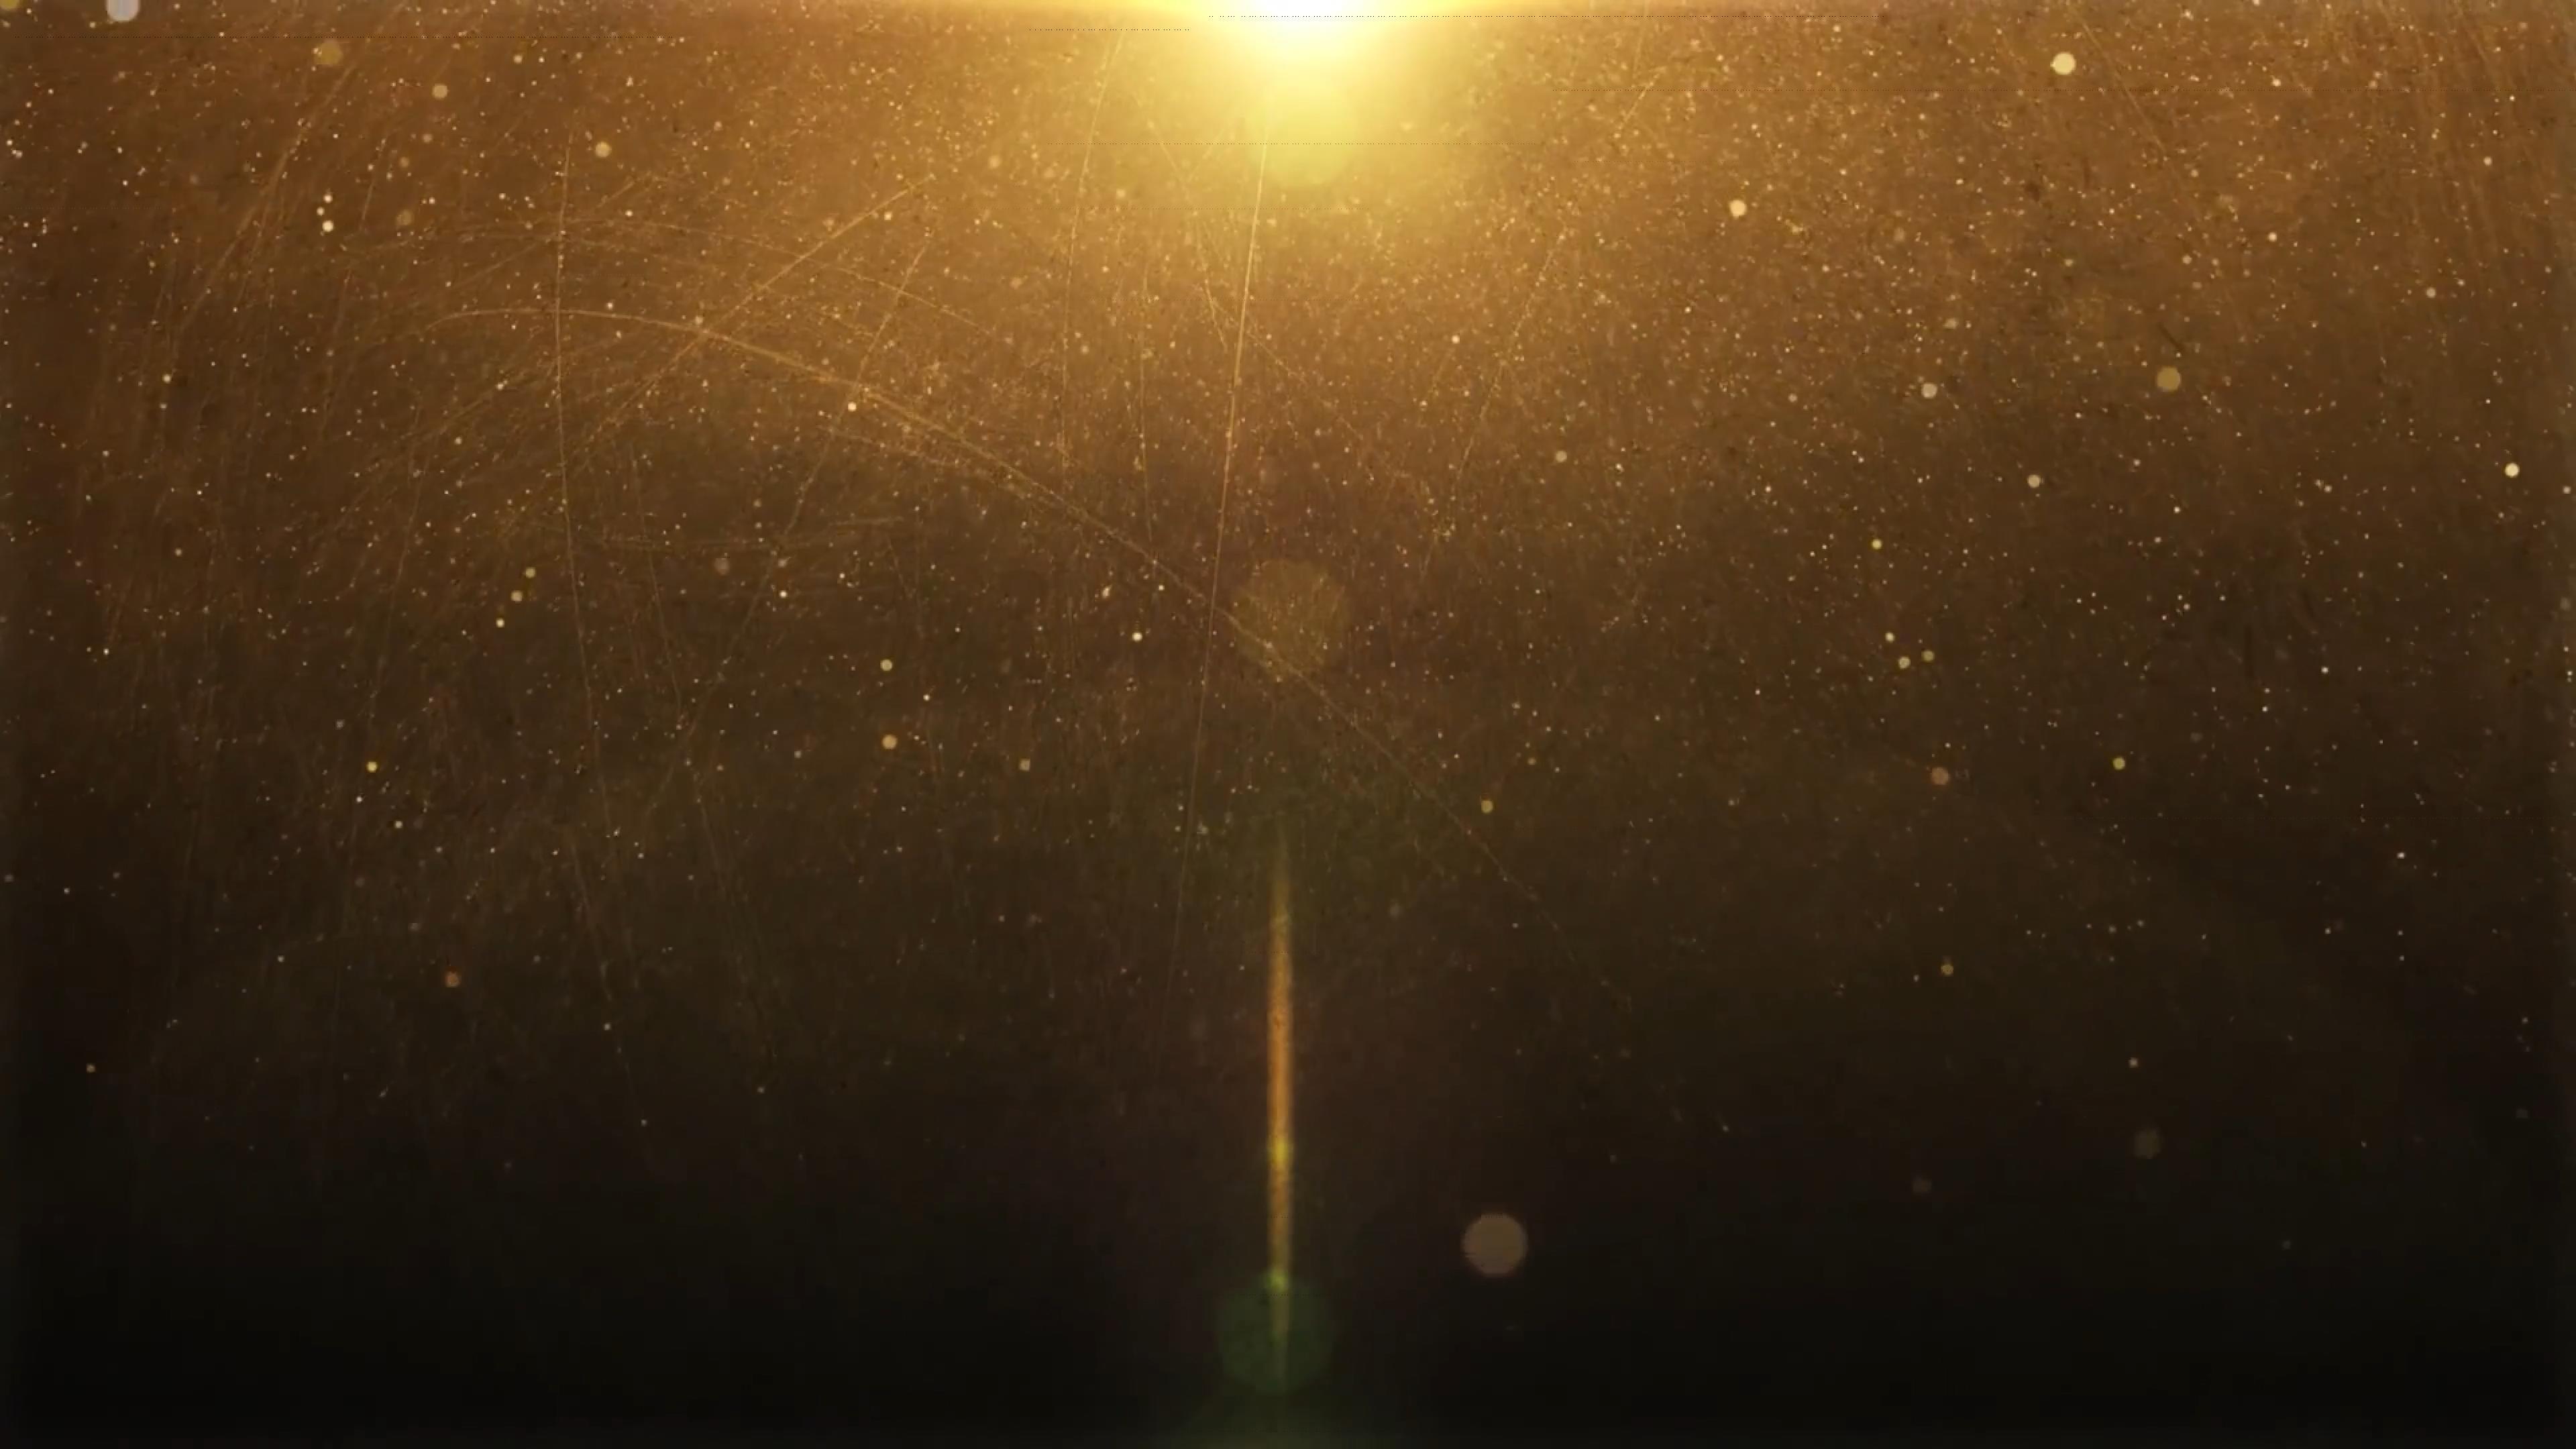 4K超清金色粒子动态背景视频素材